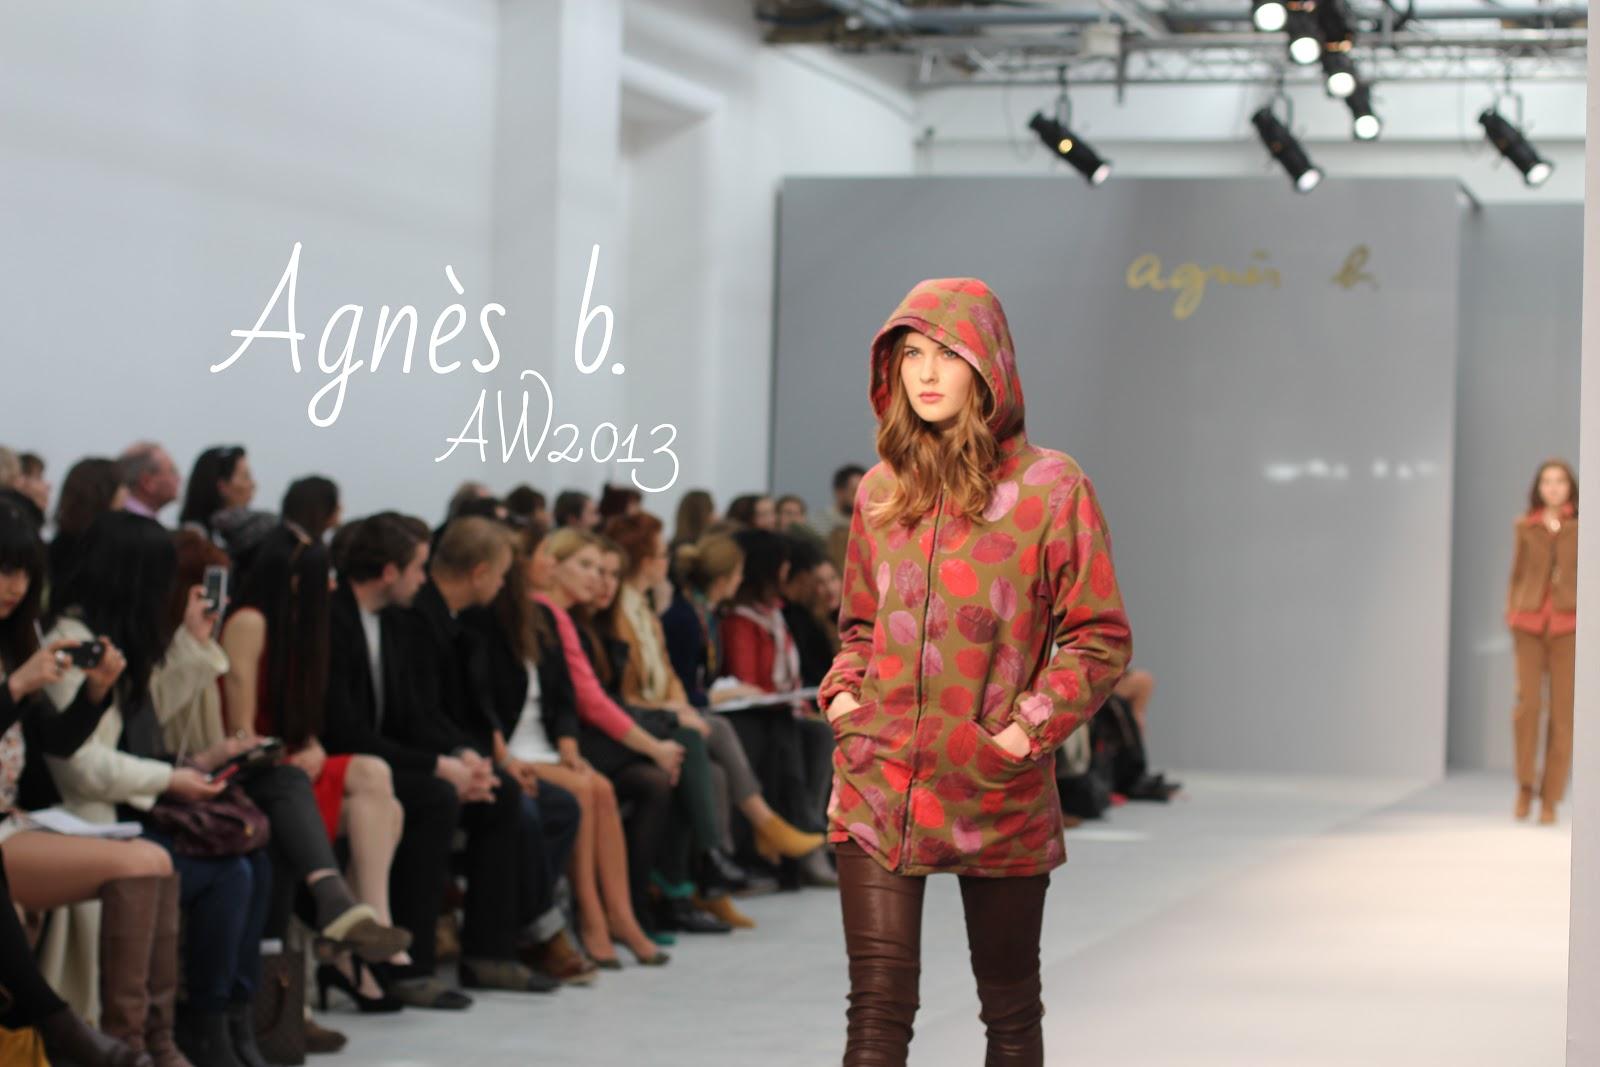 Agnès b. AH 2013 - Blog Mode - Fashion Week